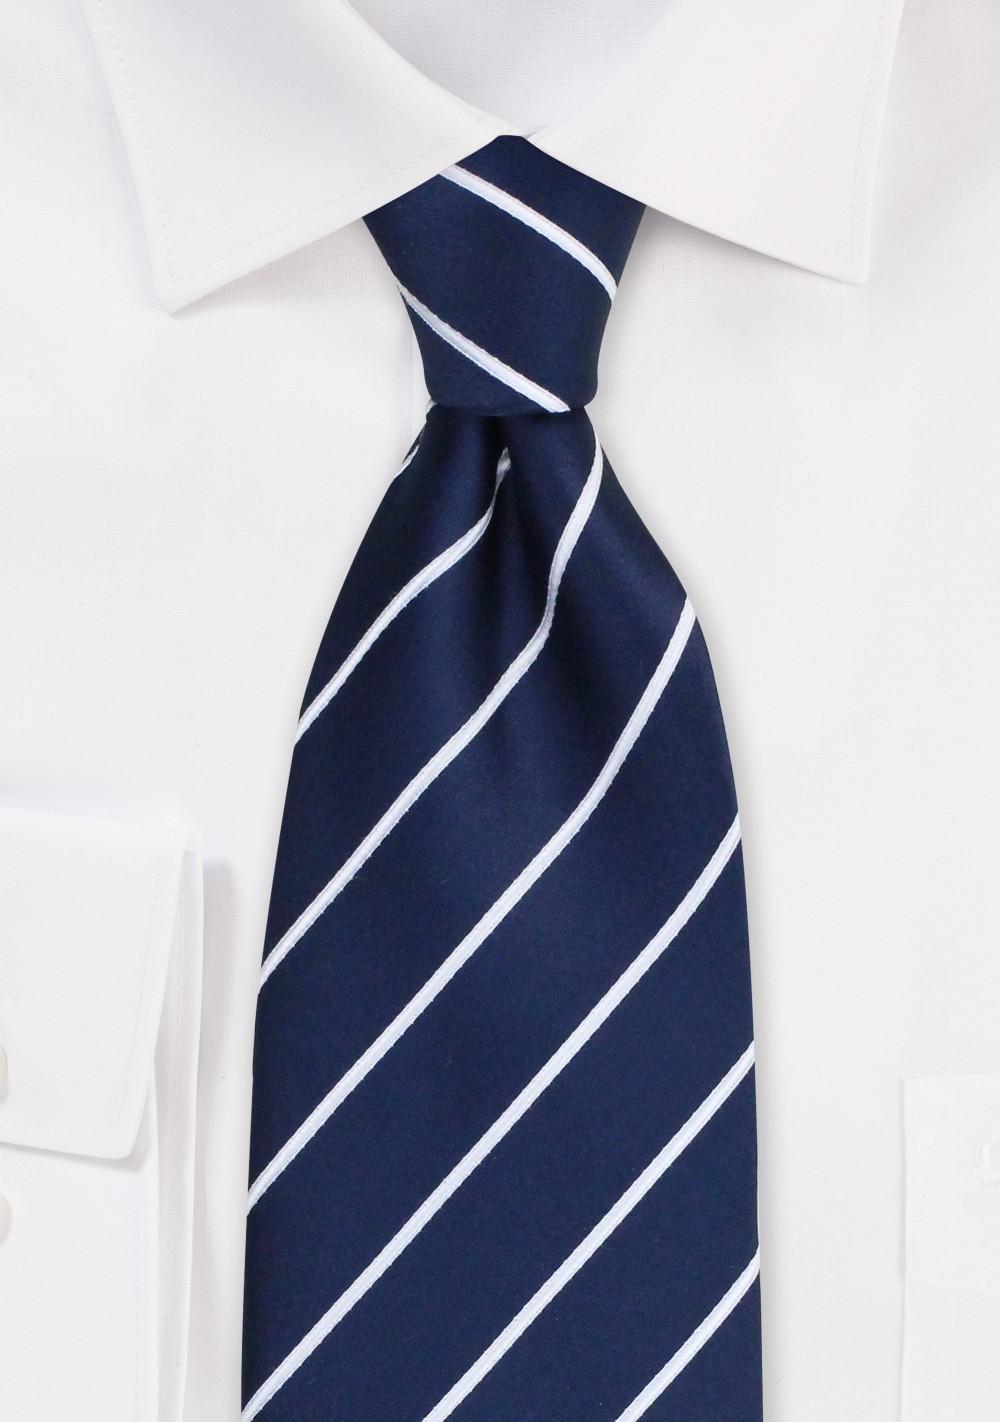 XL Marine Blue Striped Tie